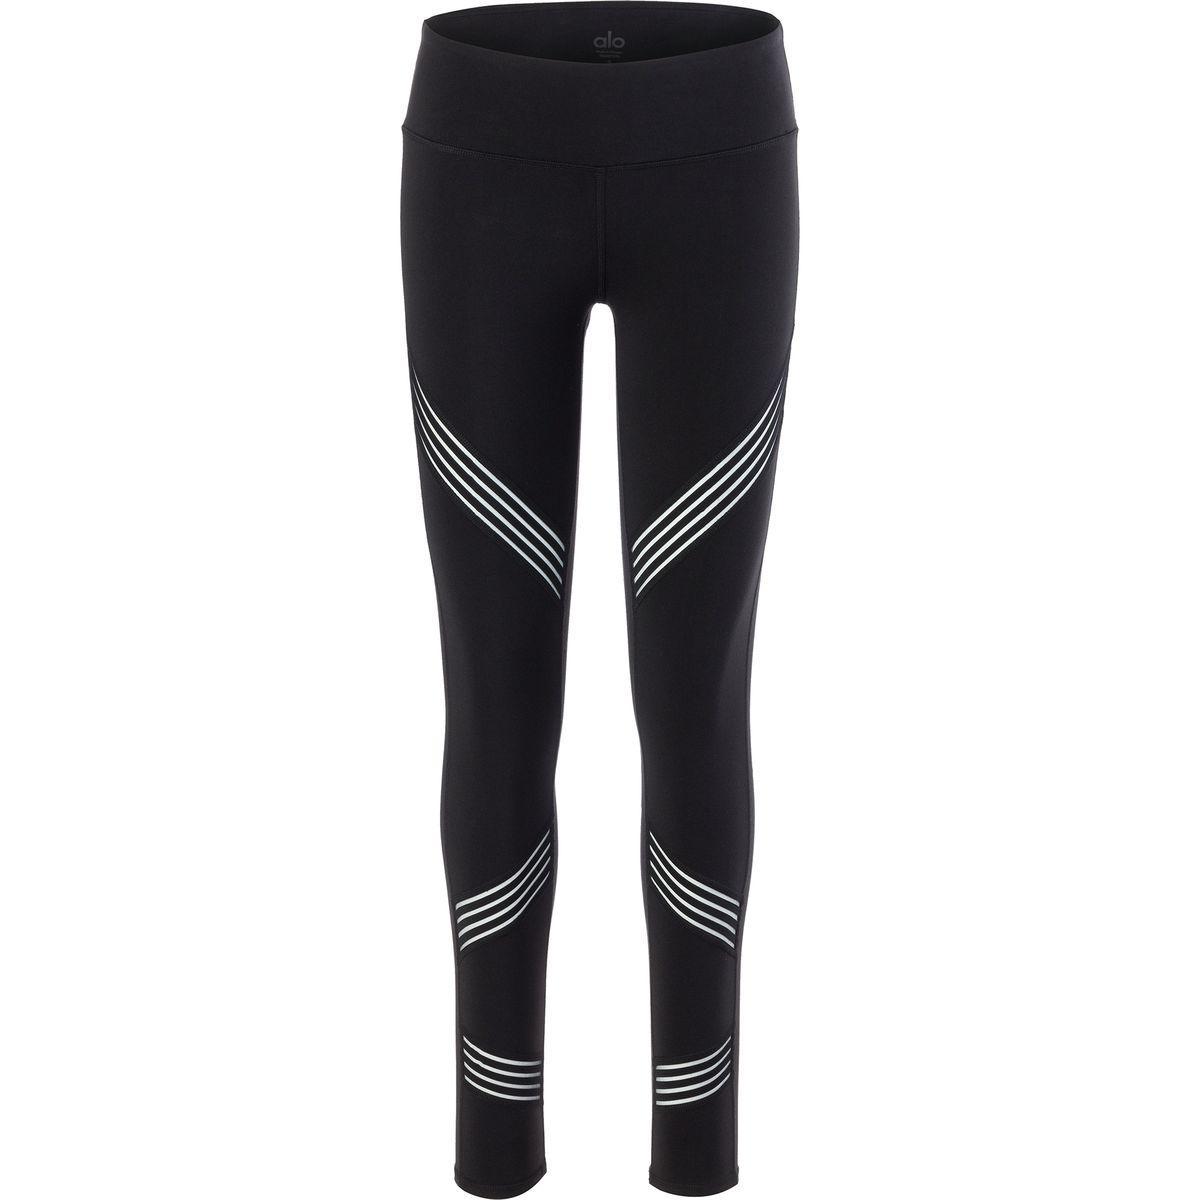 007cff1fa79fe Lyst - Alo Yoga Multi Legging in Black